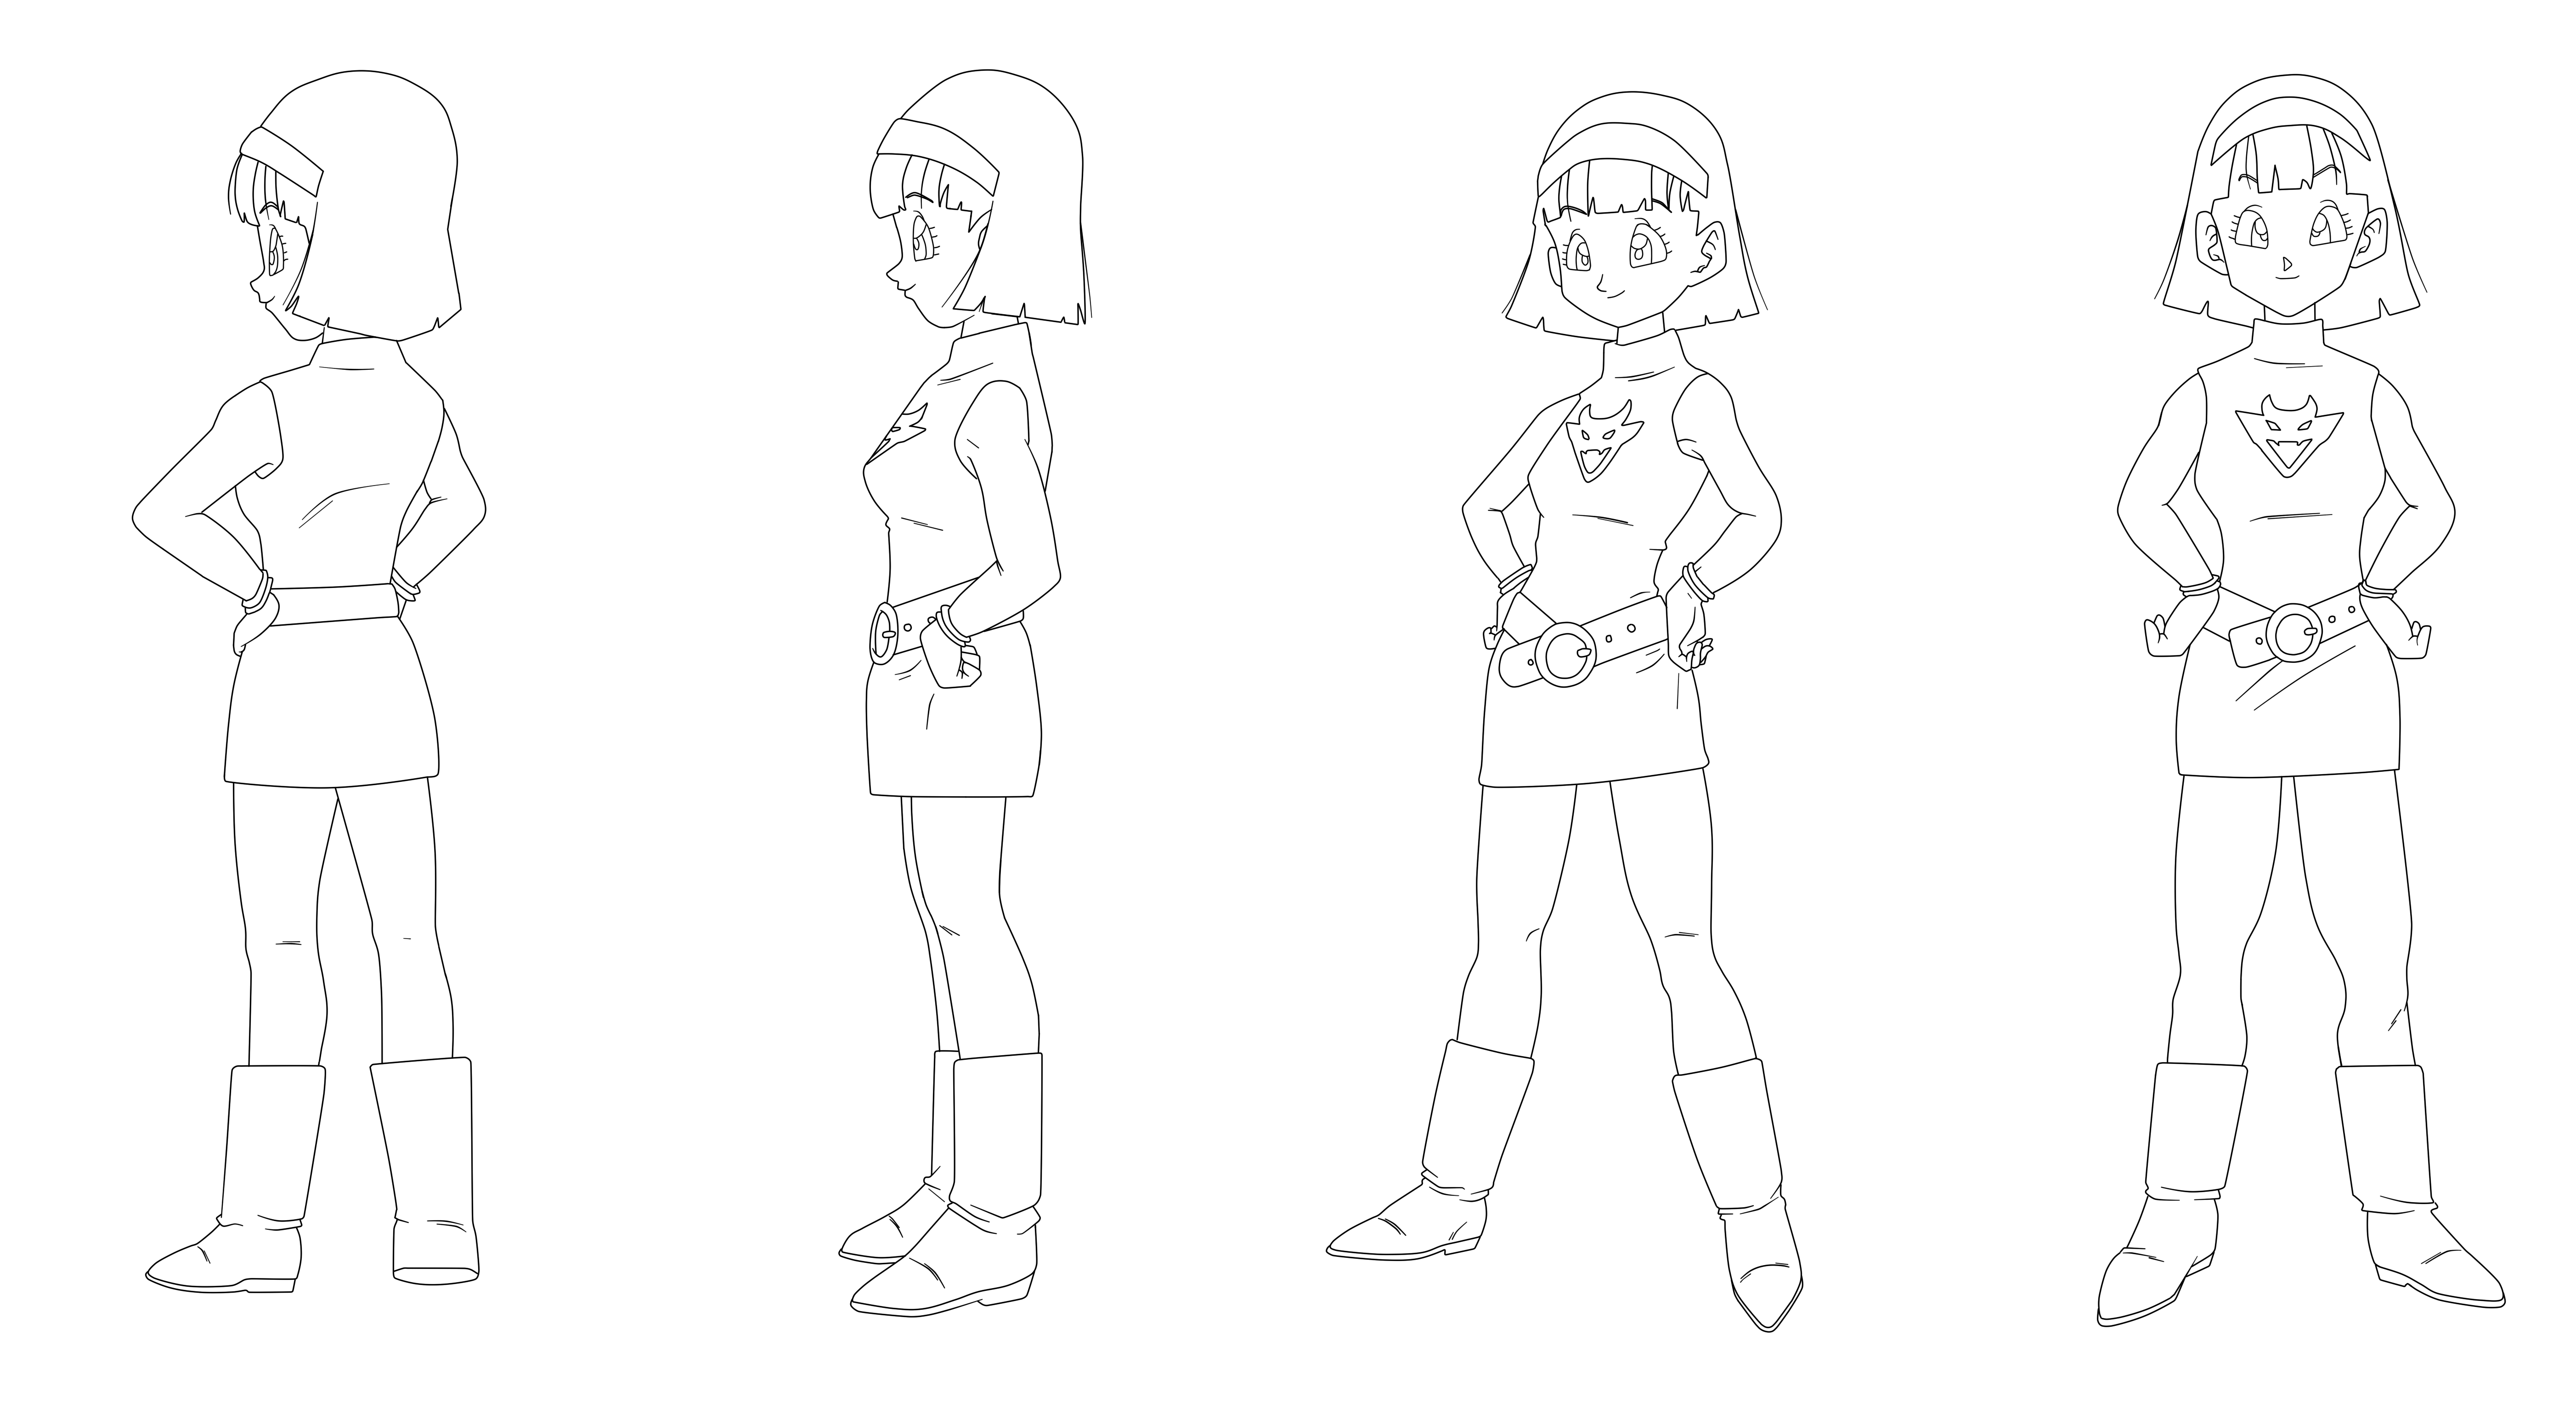 33 Lineart - Videl [Battle of Gods] by keikuro on DeviantArt